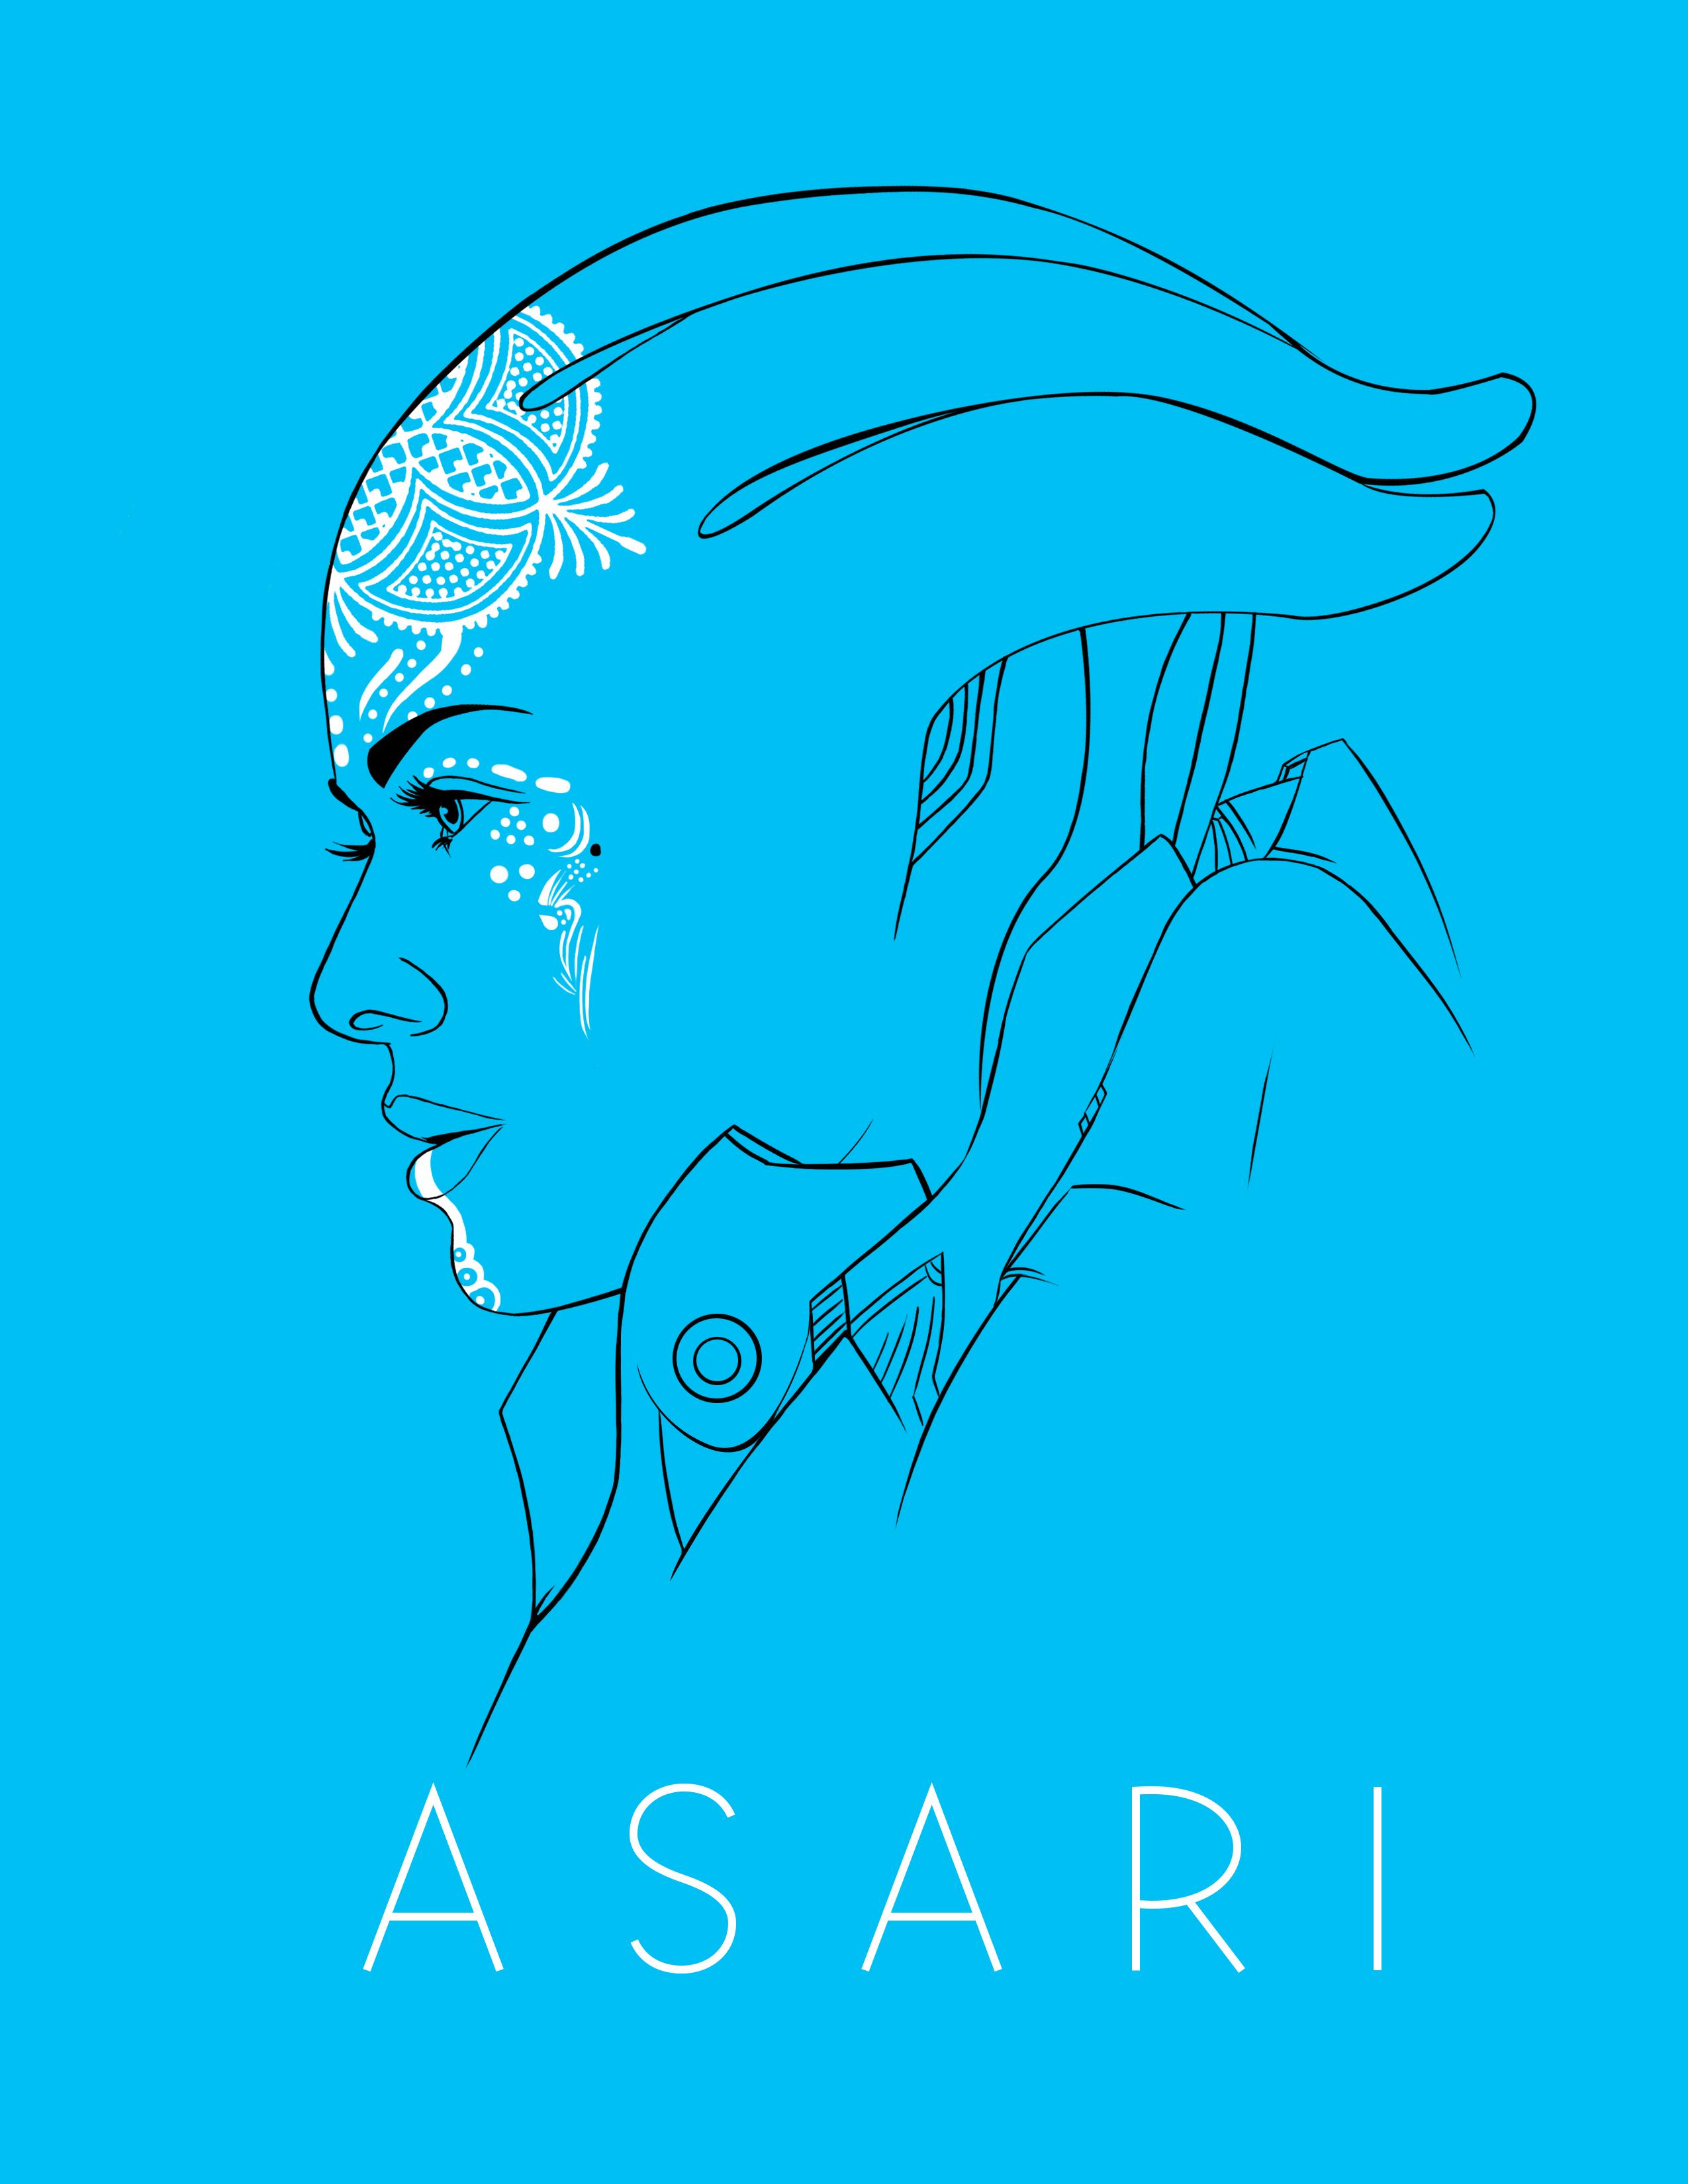 Asari by trpbootan